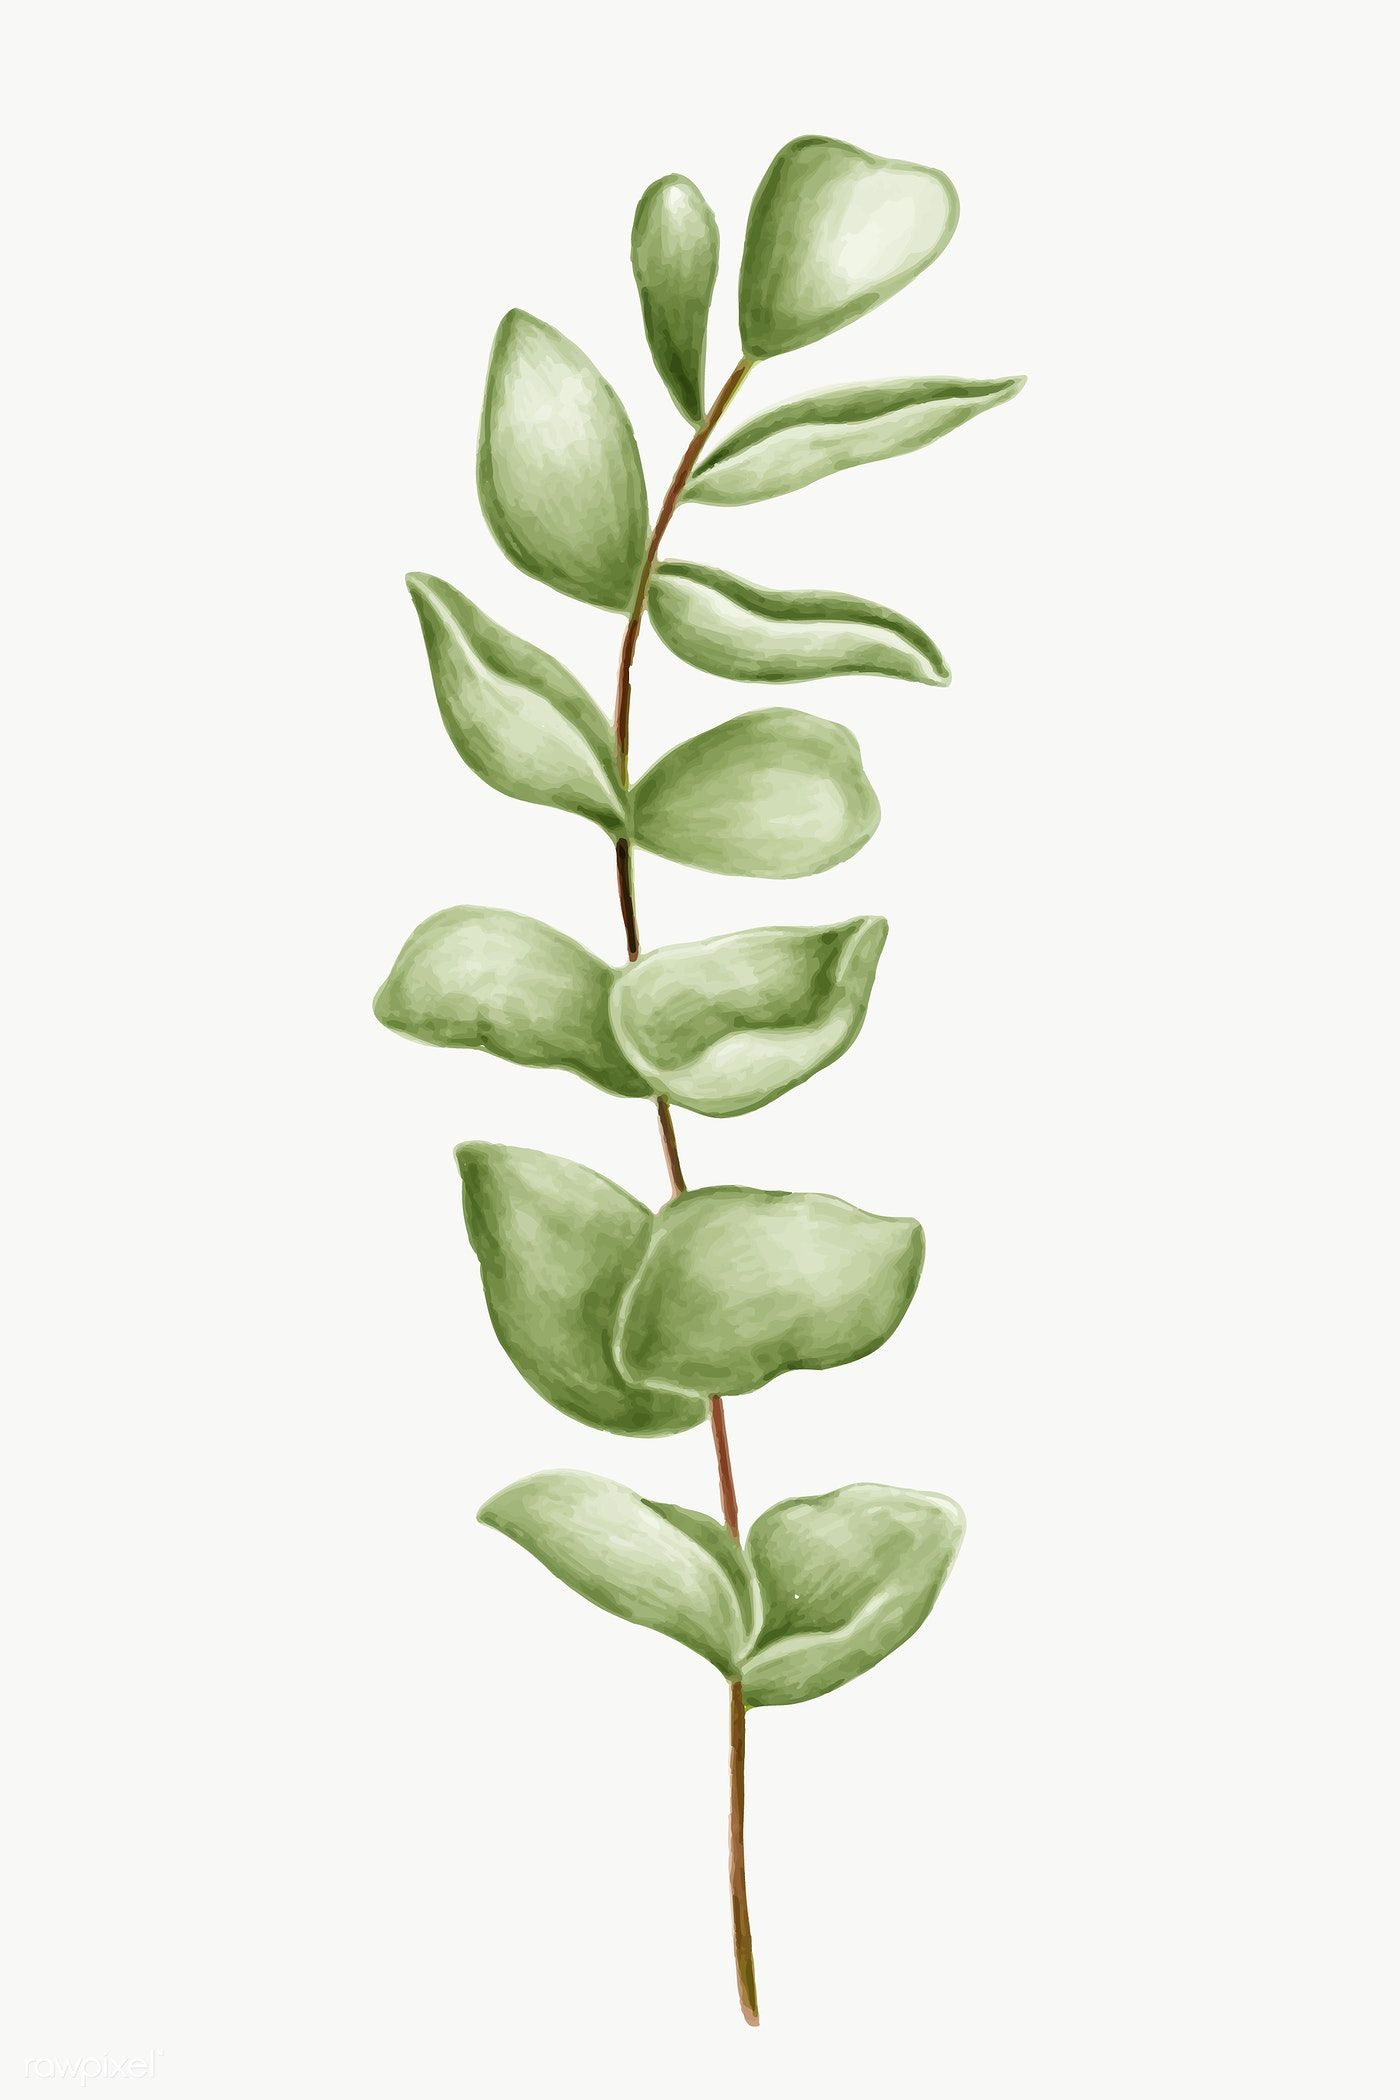 Hand Drawn Green Leaves Transparent Png Free Image By Rawpixel Com Noon Flower Illustration Green Leaf Background Leaf Images